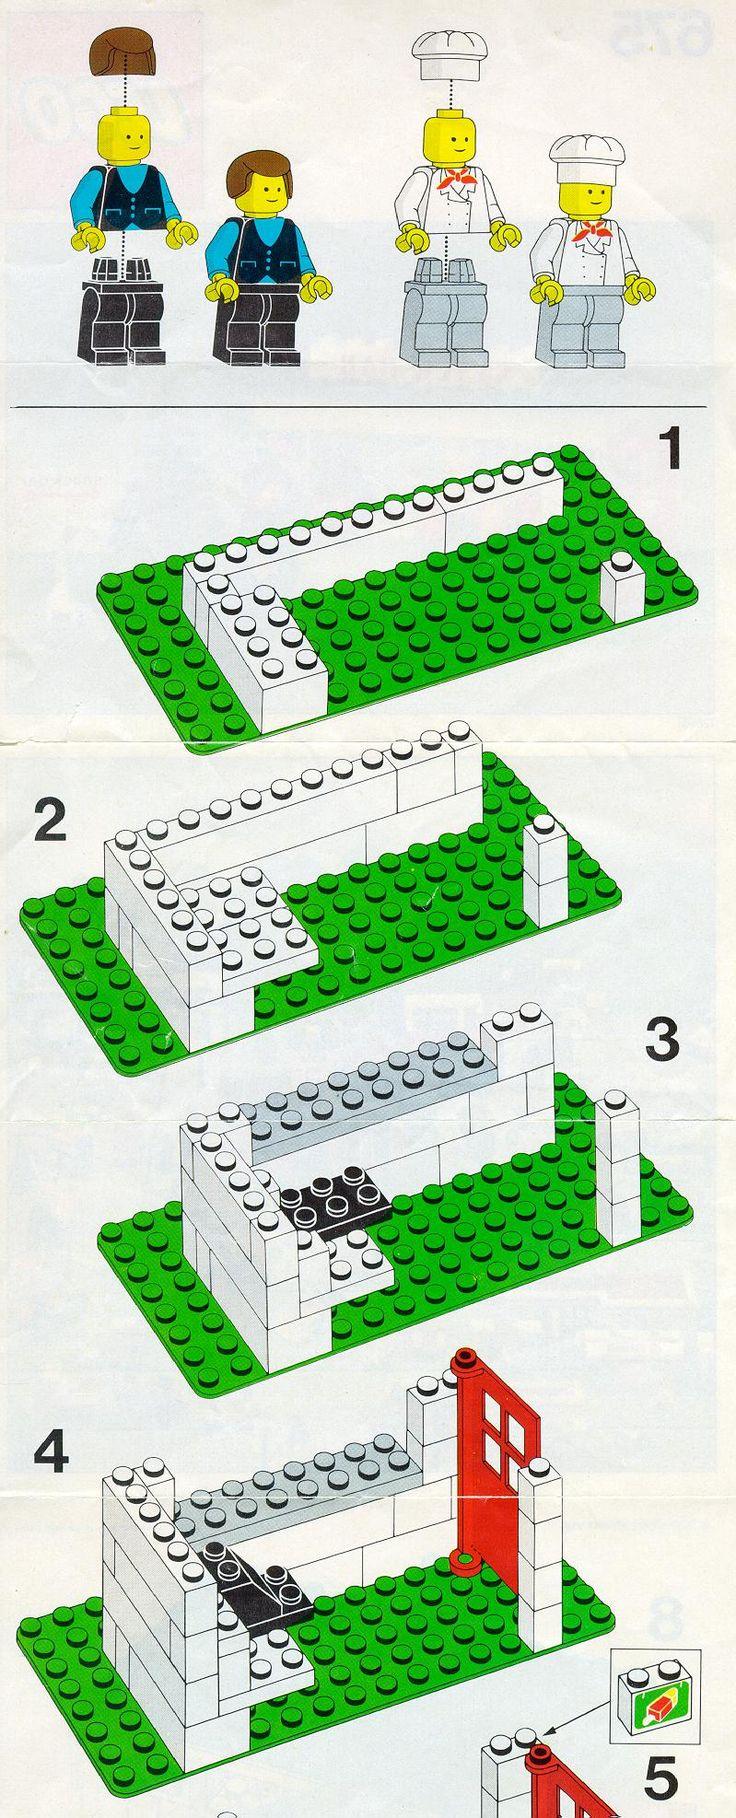 Lego House Plans Best 25 Lego Design Ideas Only On Pinterest Lego Lego